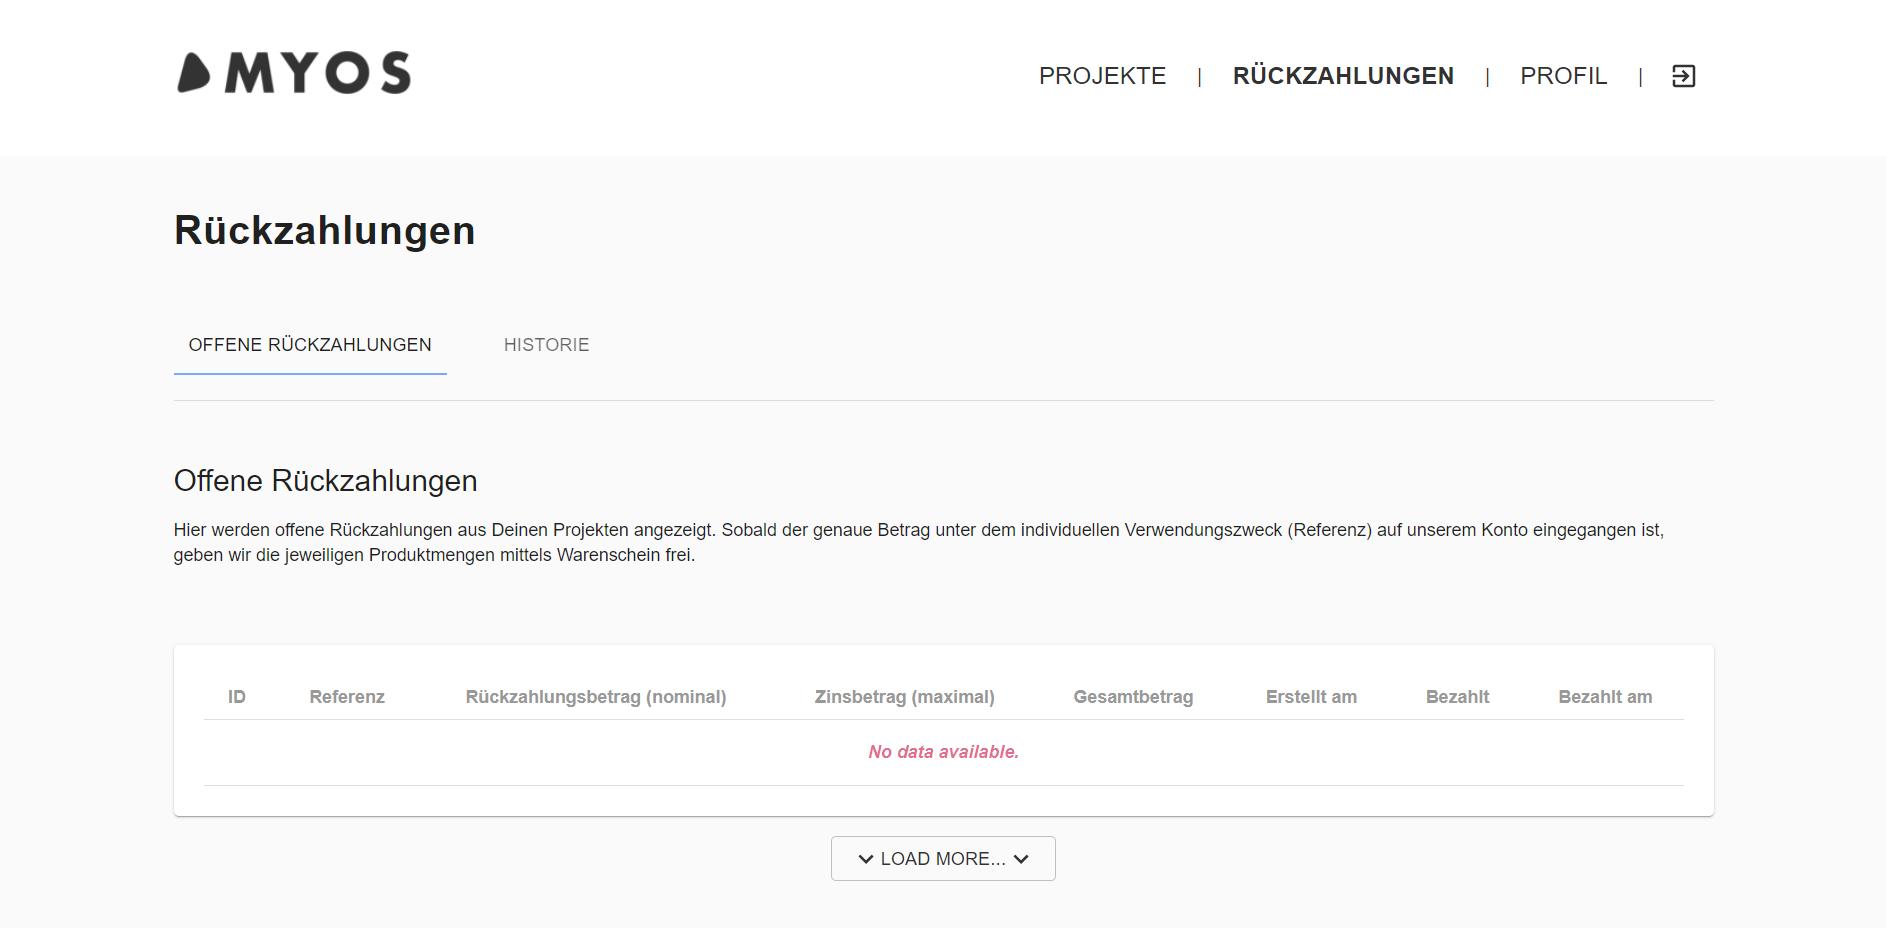 Myos App Rueckzahlung Finanzierung